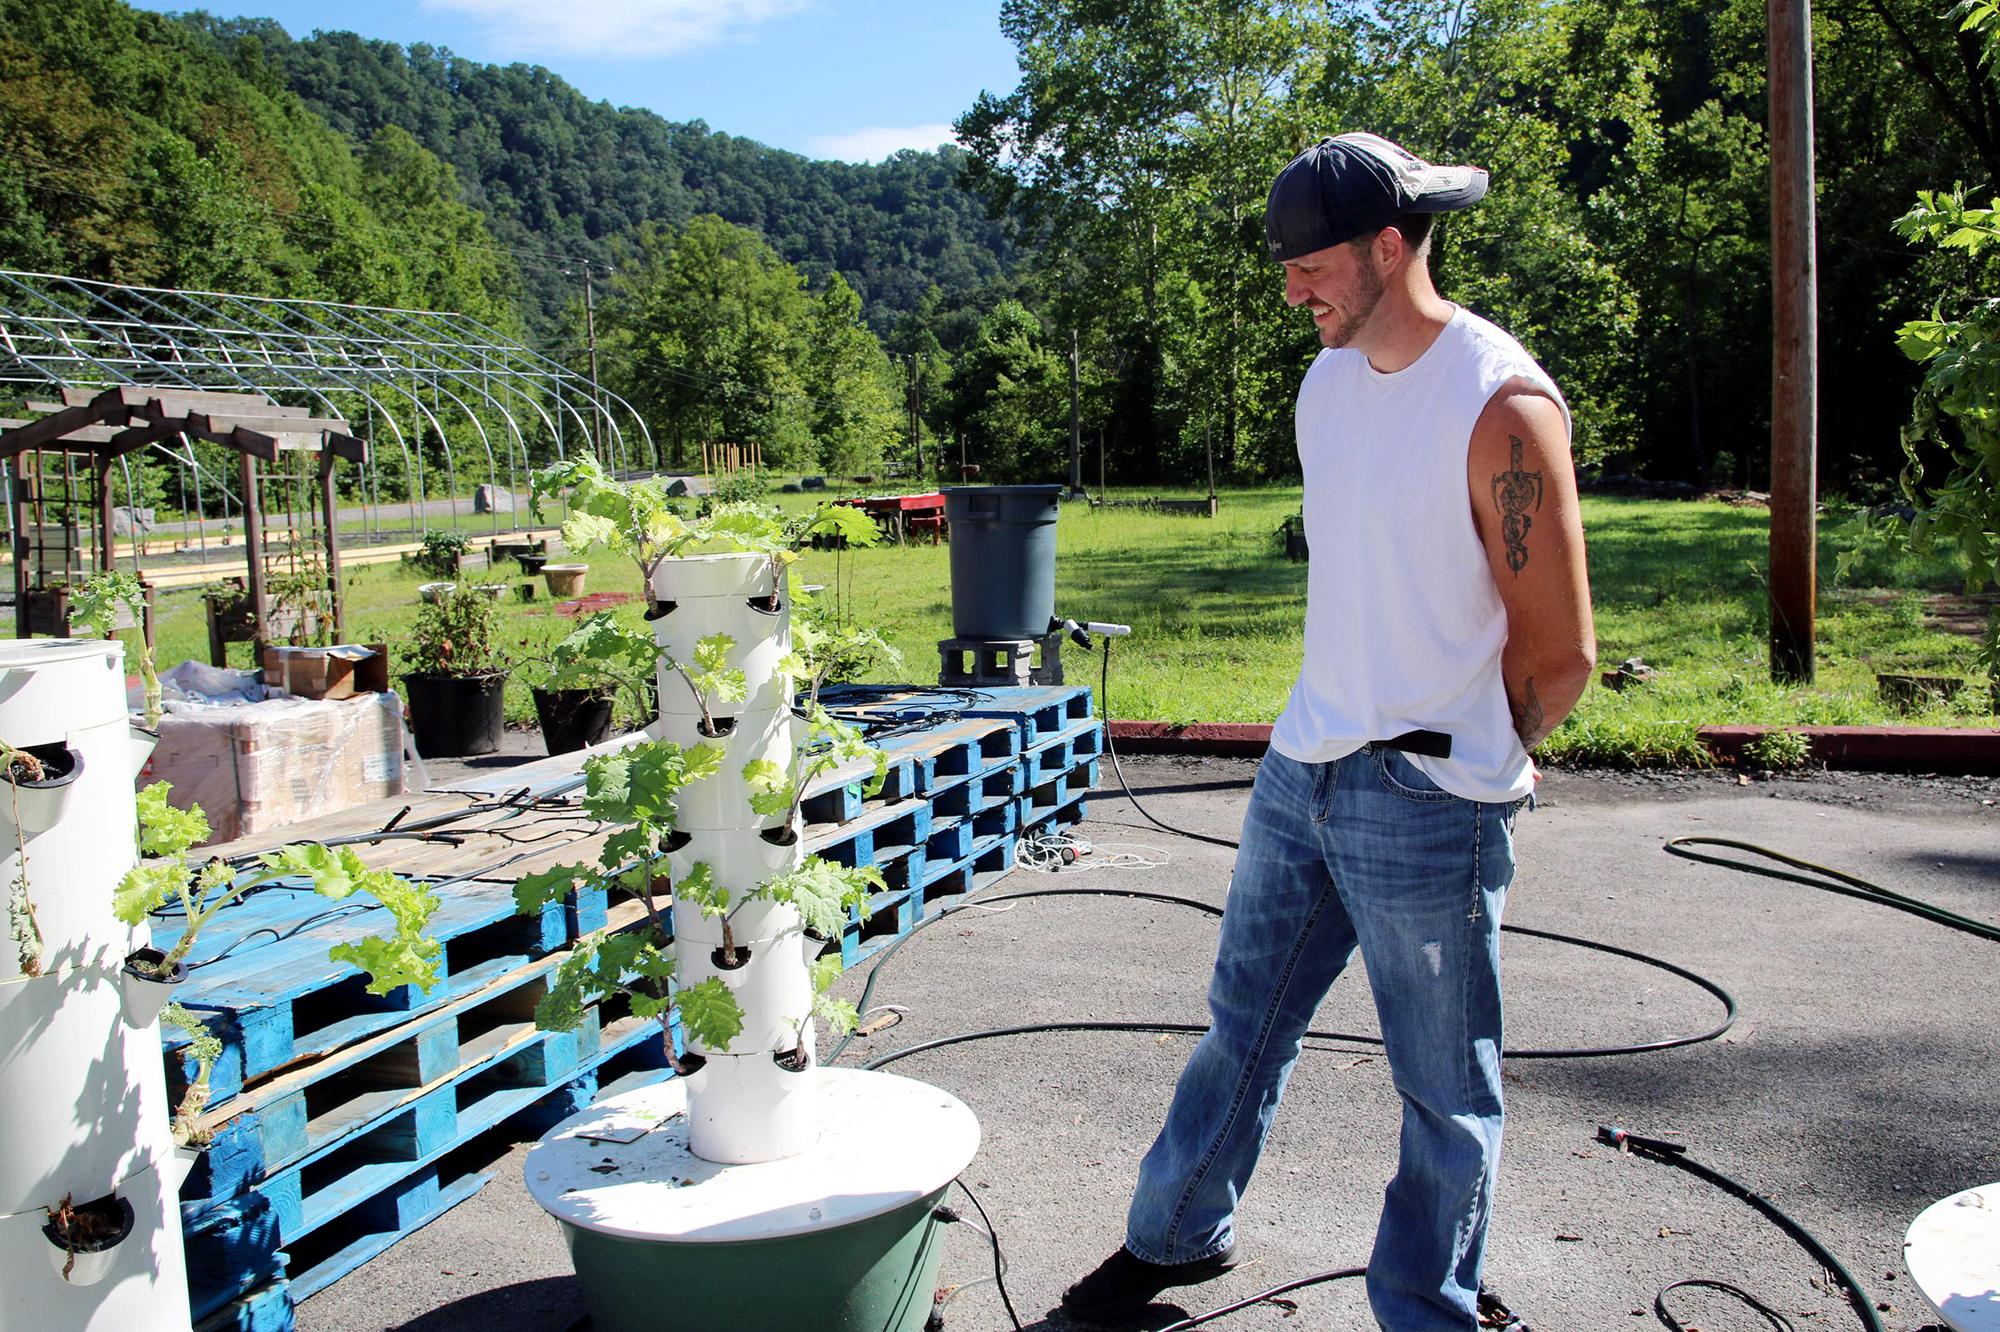 In Coal Country, Farmers Get Creative To Bridge The Fresh Produce Gap